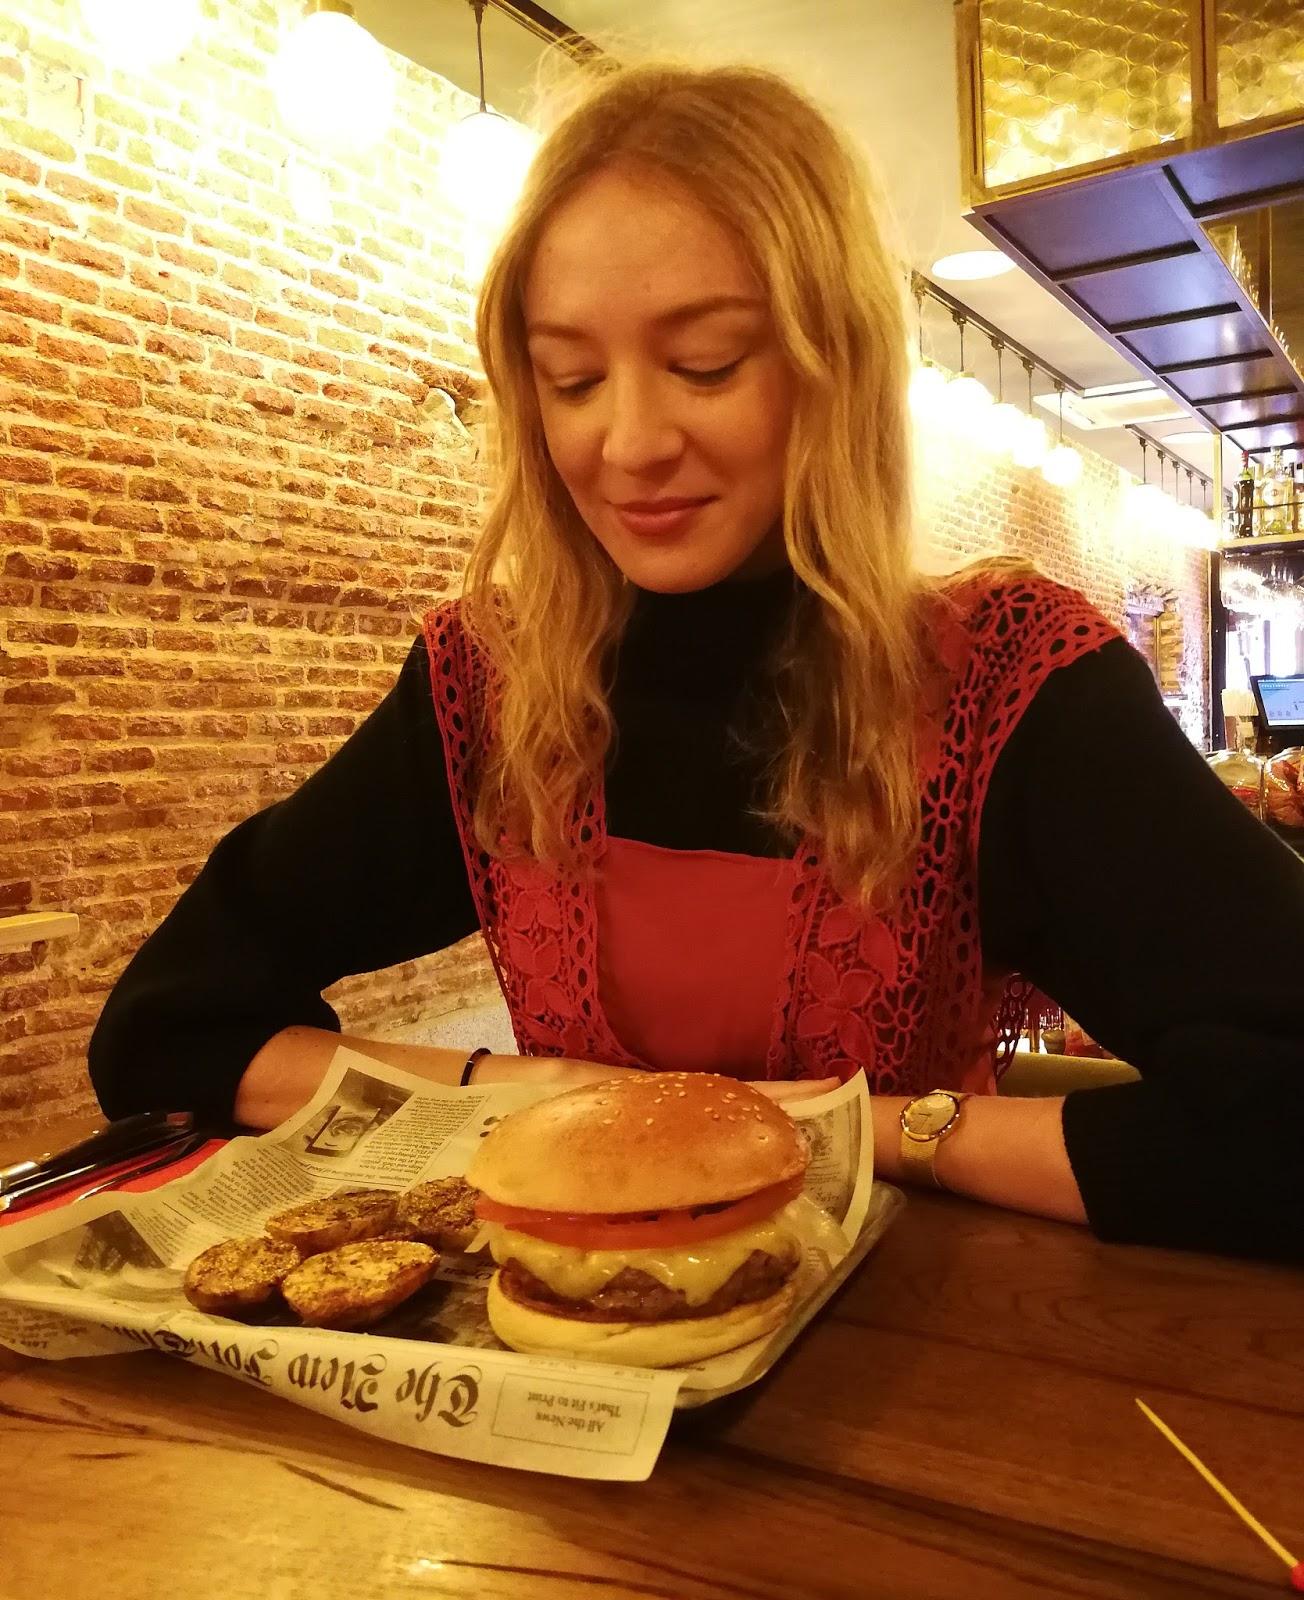 Santo-pecado-madrid-restaurantes-hamburgueserias-black-angus